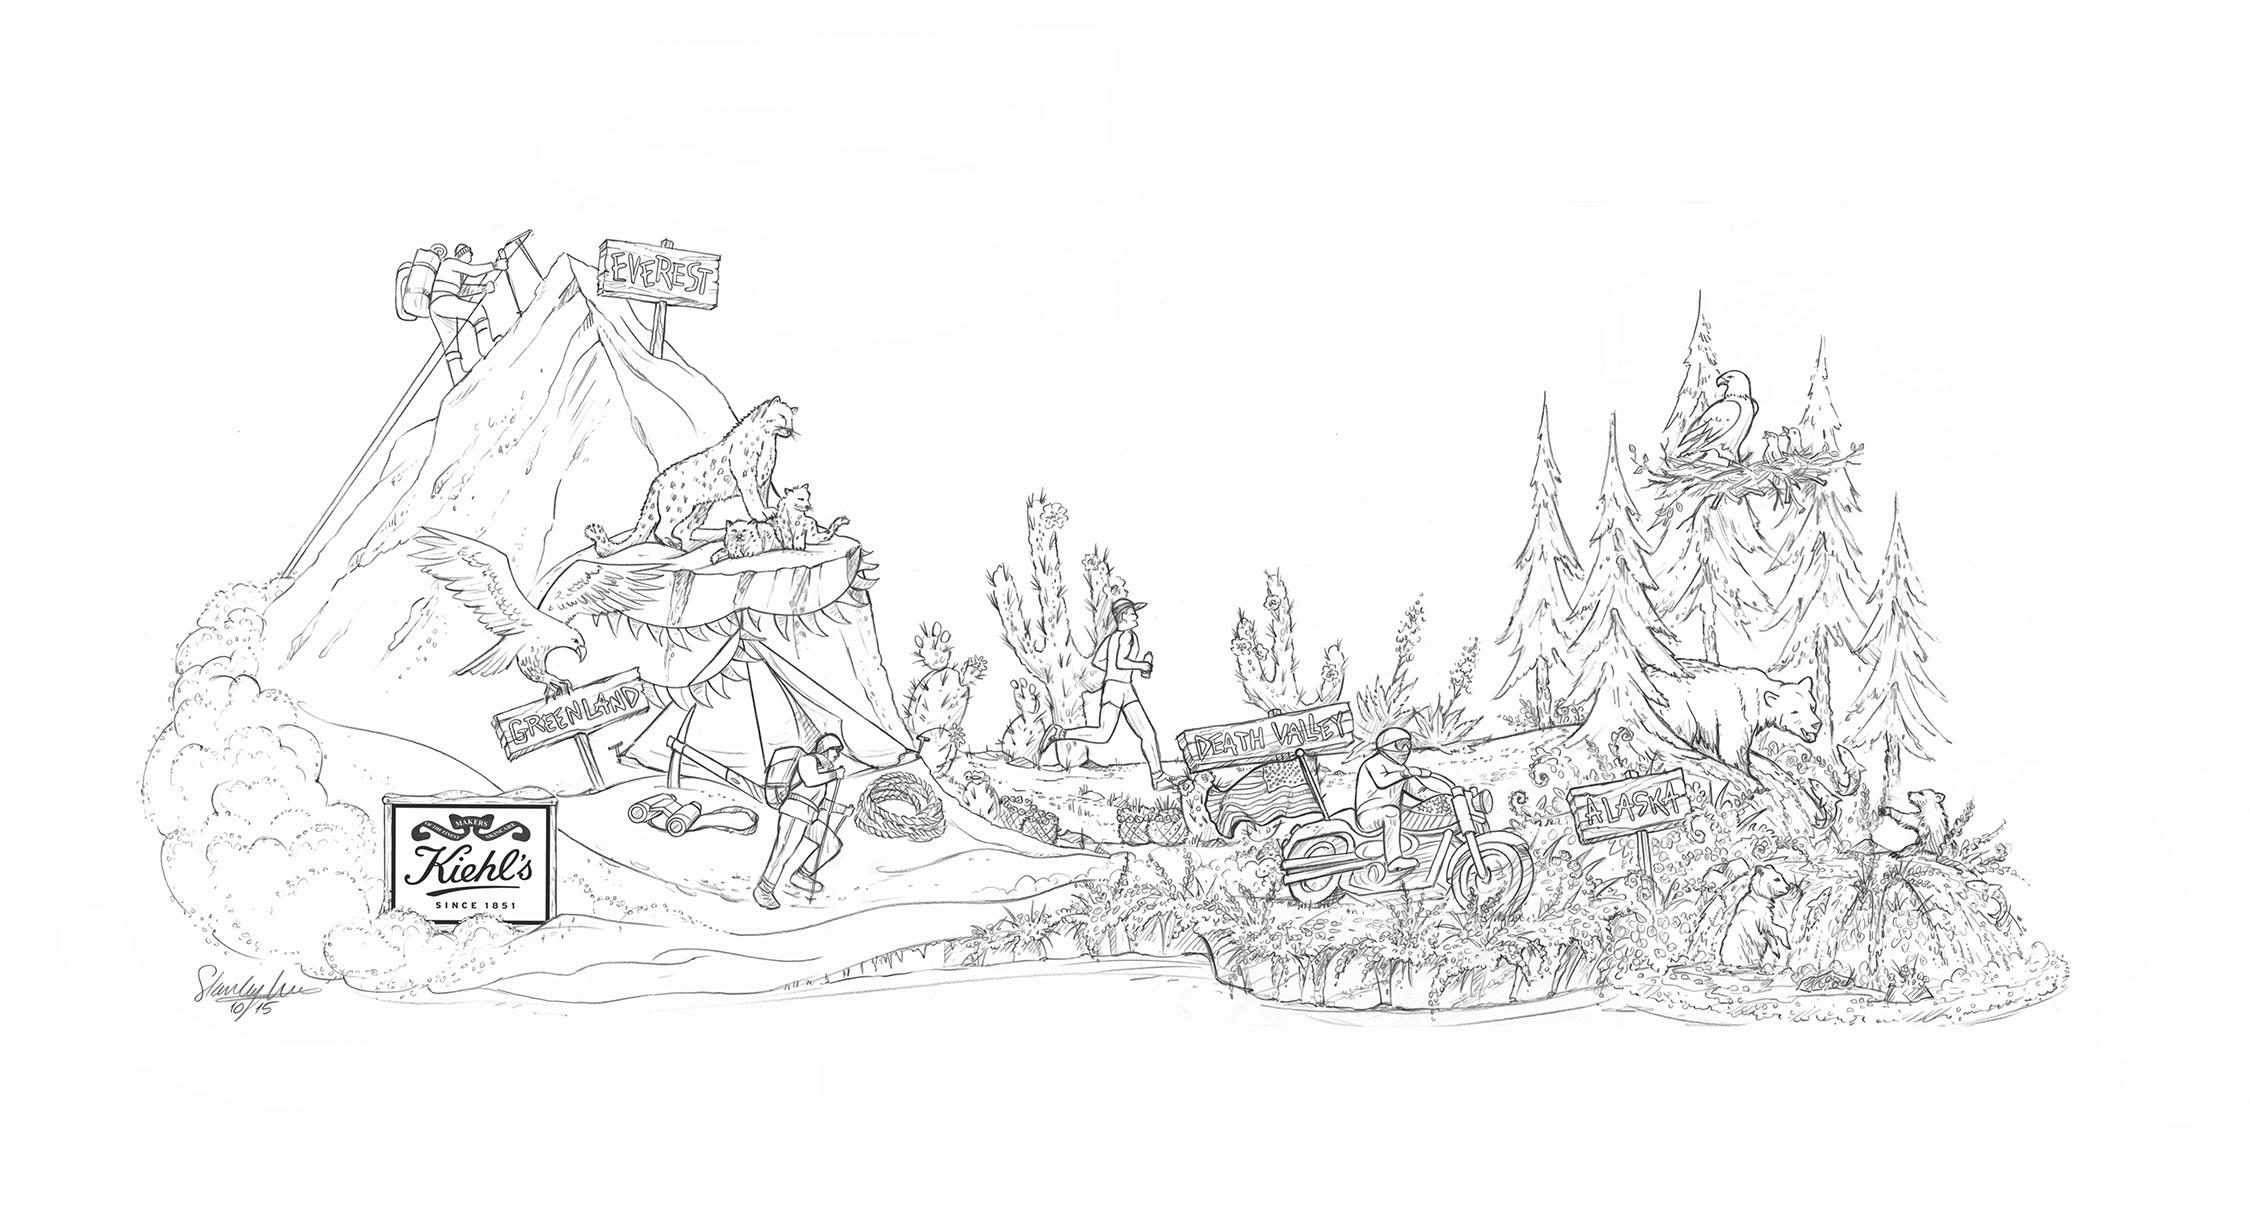 Kiehl's Since 1851 2016 Final Sketch by Stanley A. Meyer